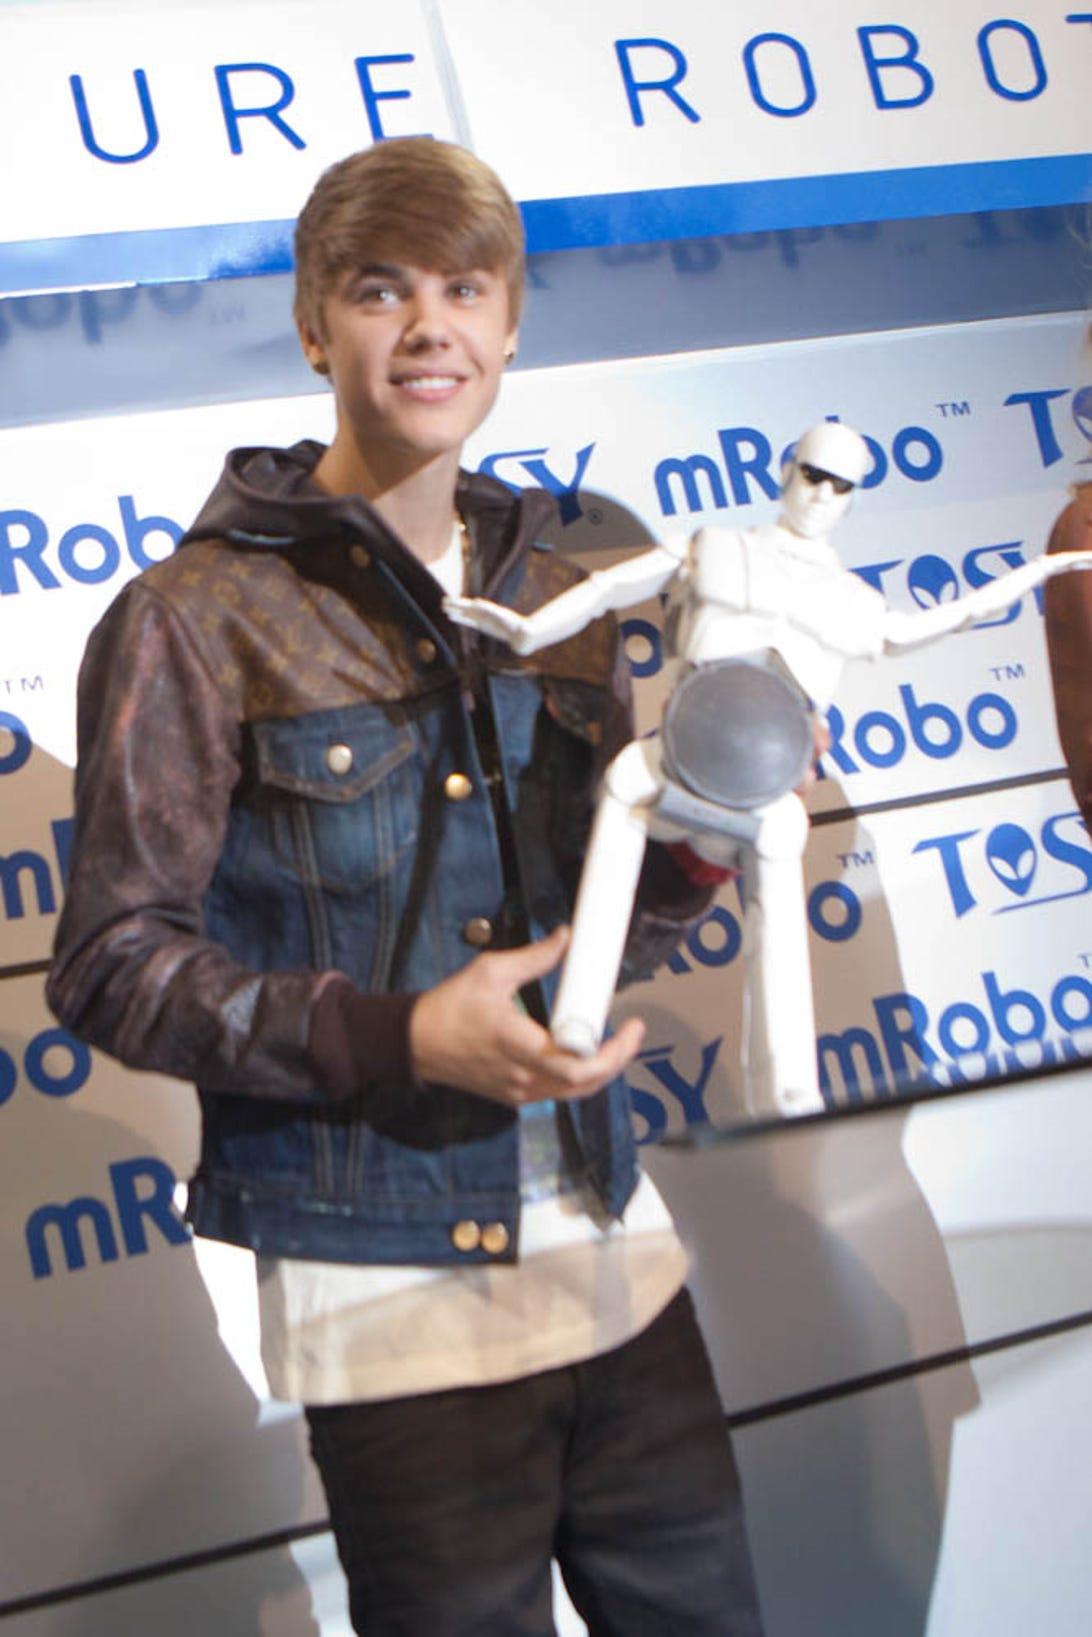 Justin-Bieber-CES-7519.jpg